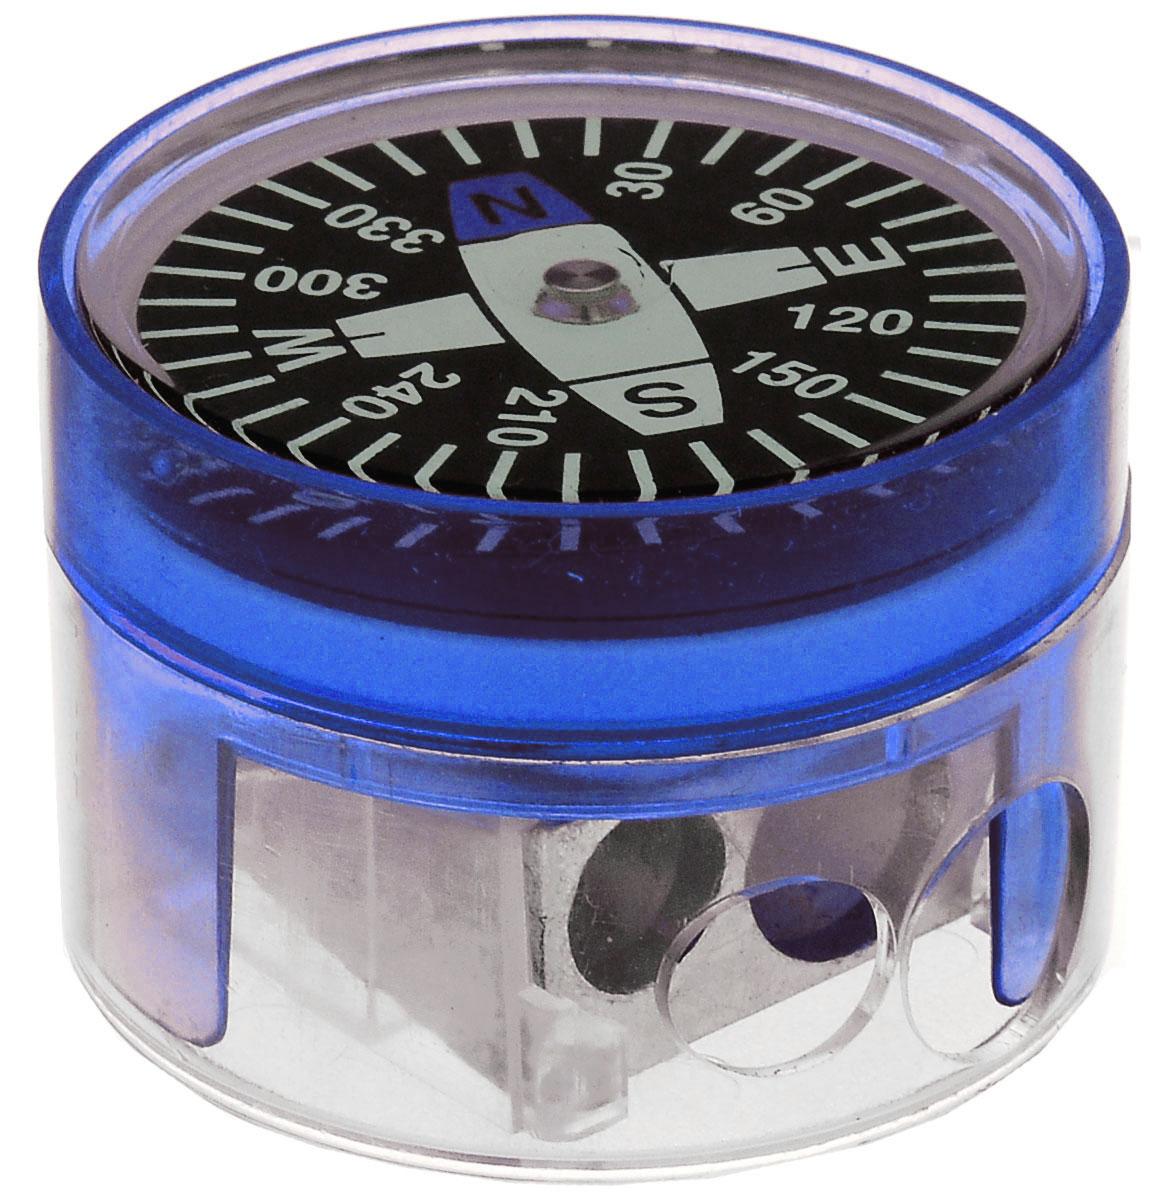 Brunnen Точилка двойная Компас цвет синий 29836\255718\BCD_синий